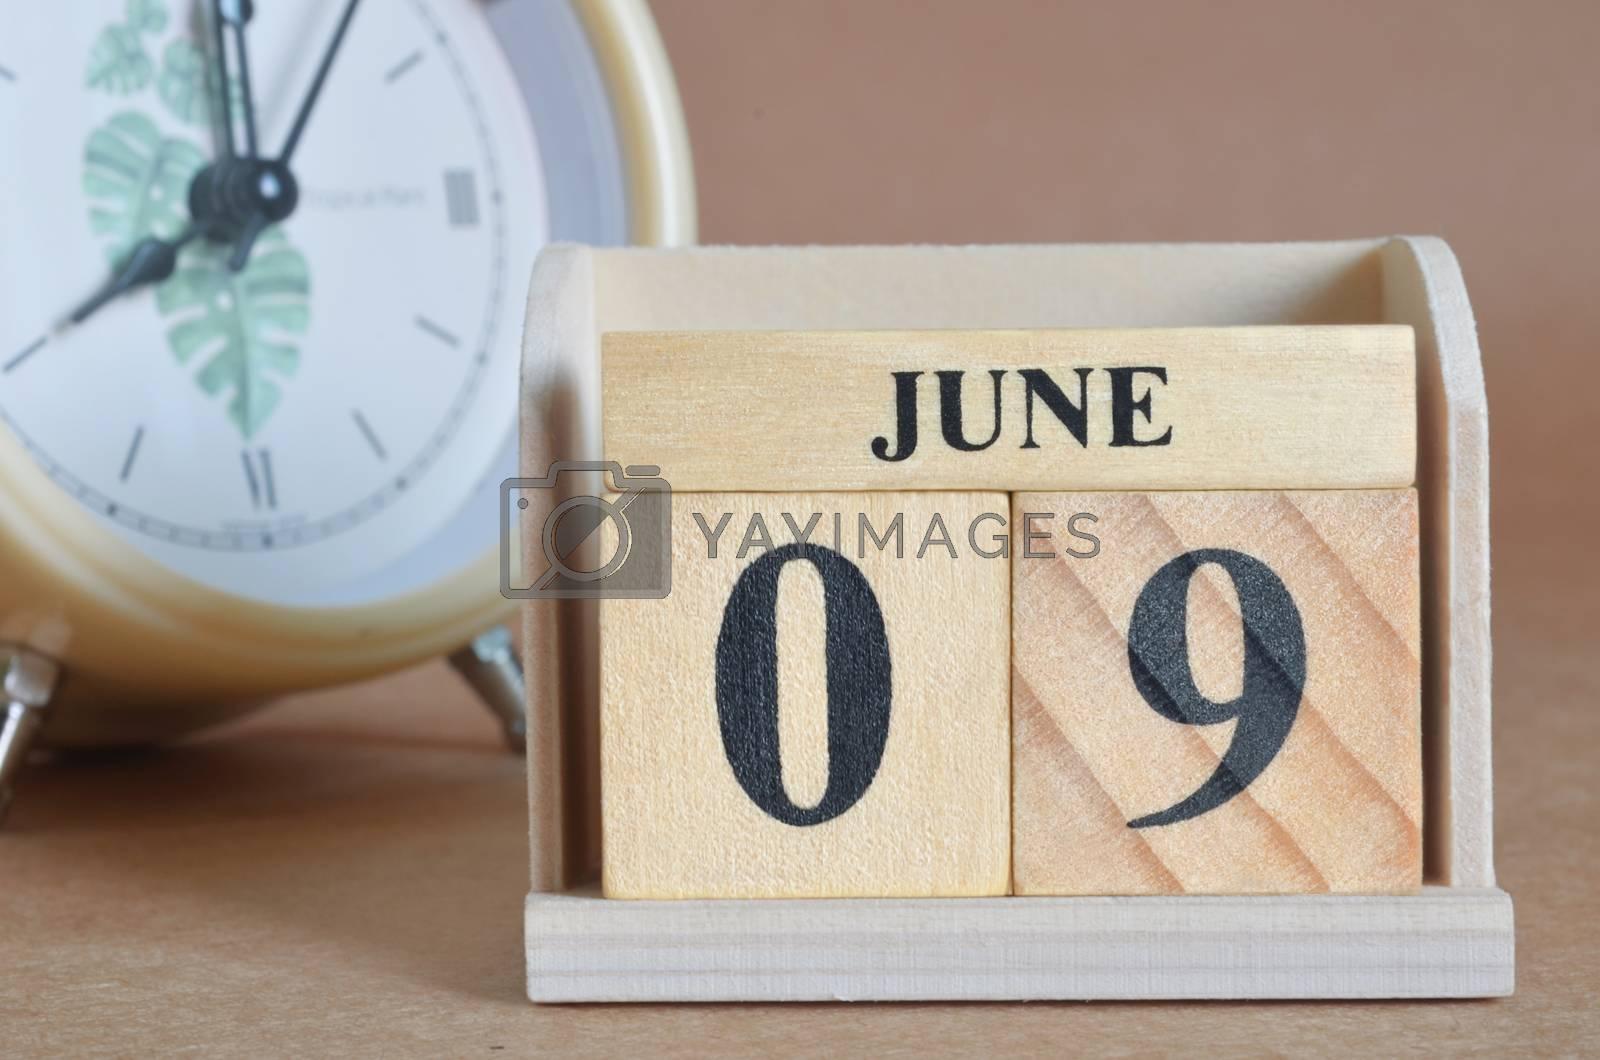 June 9 by Mrfrost